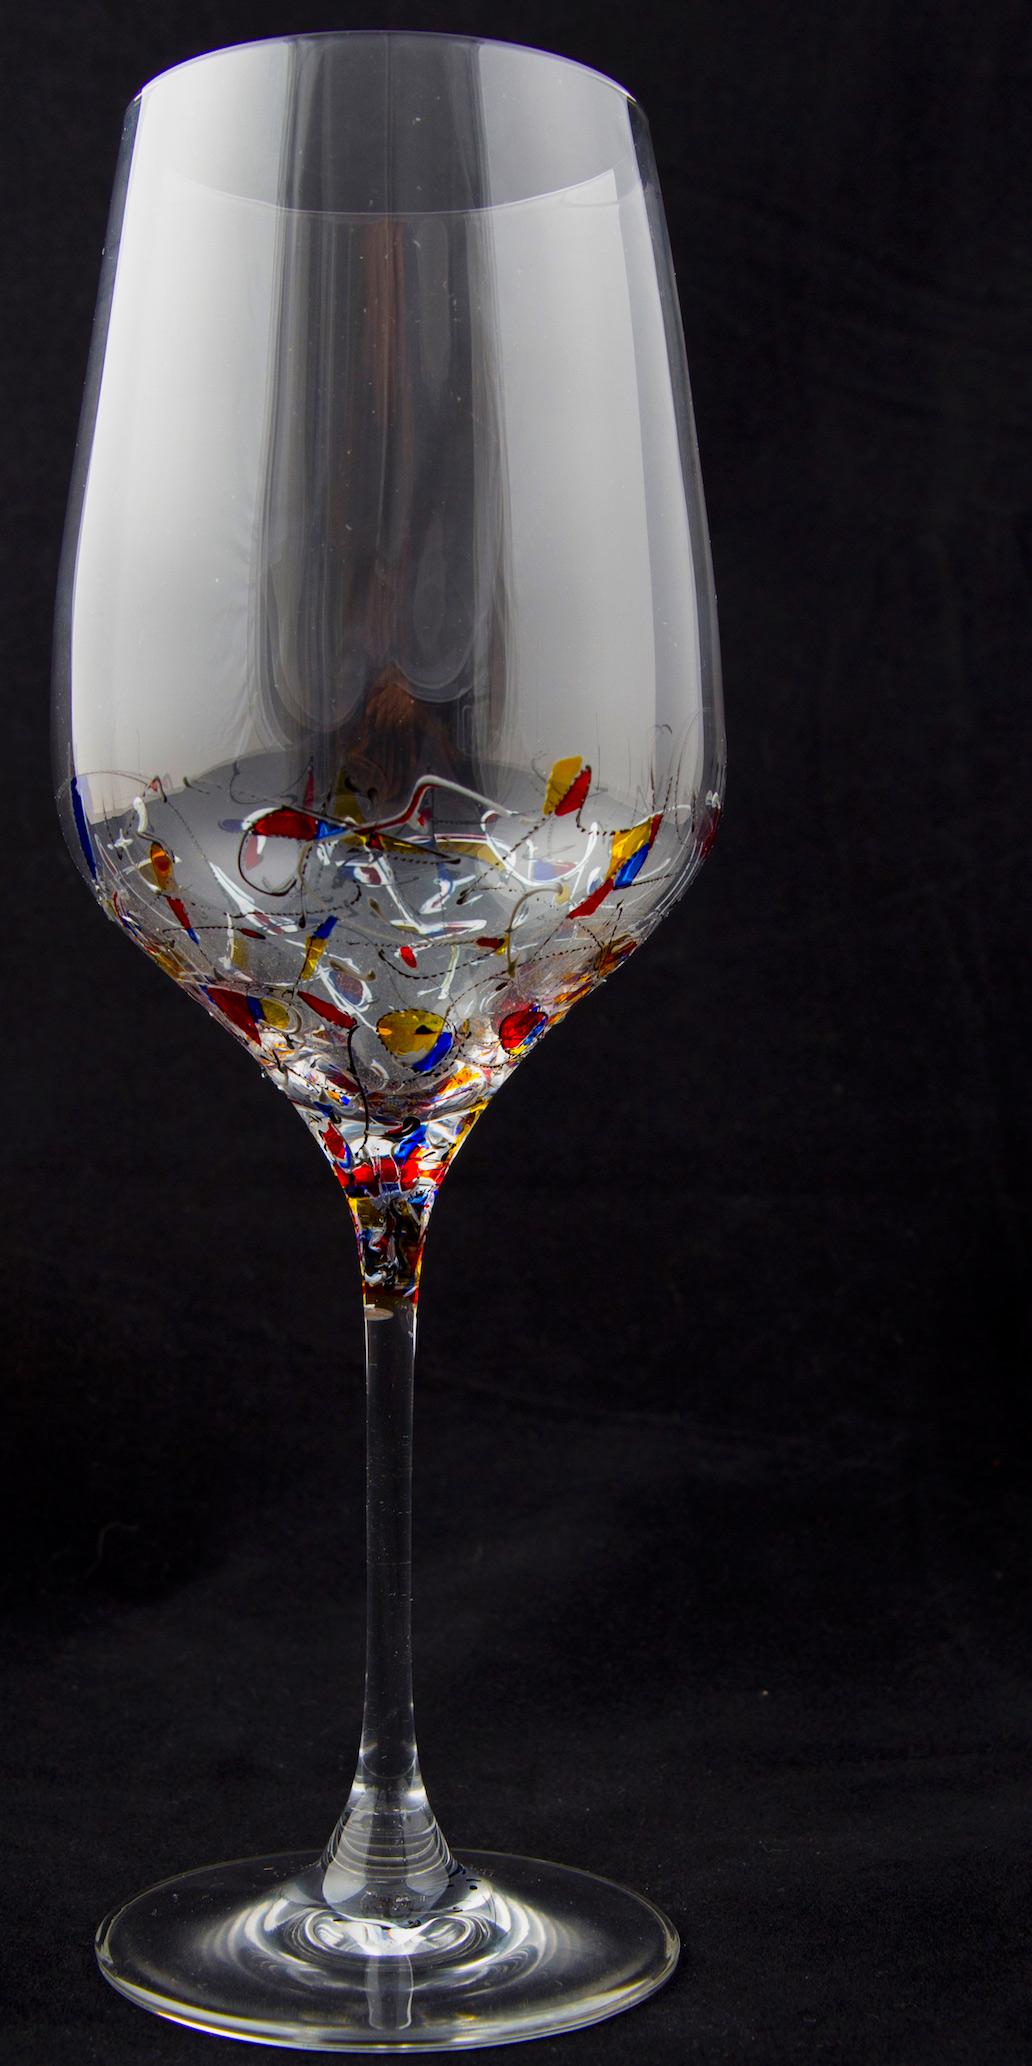 juego de copas decoradas a mano fantas a arte en cristal